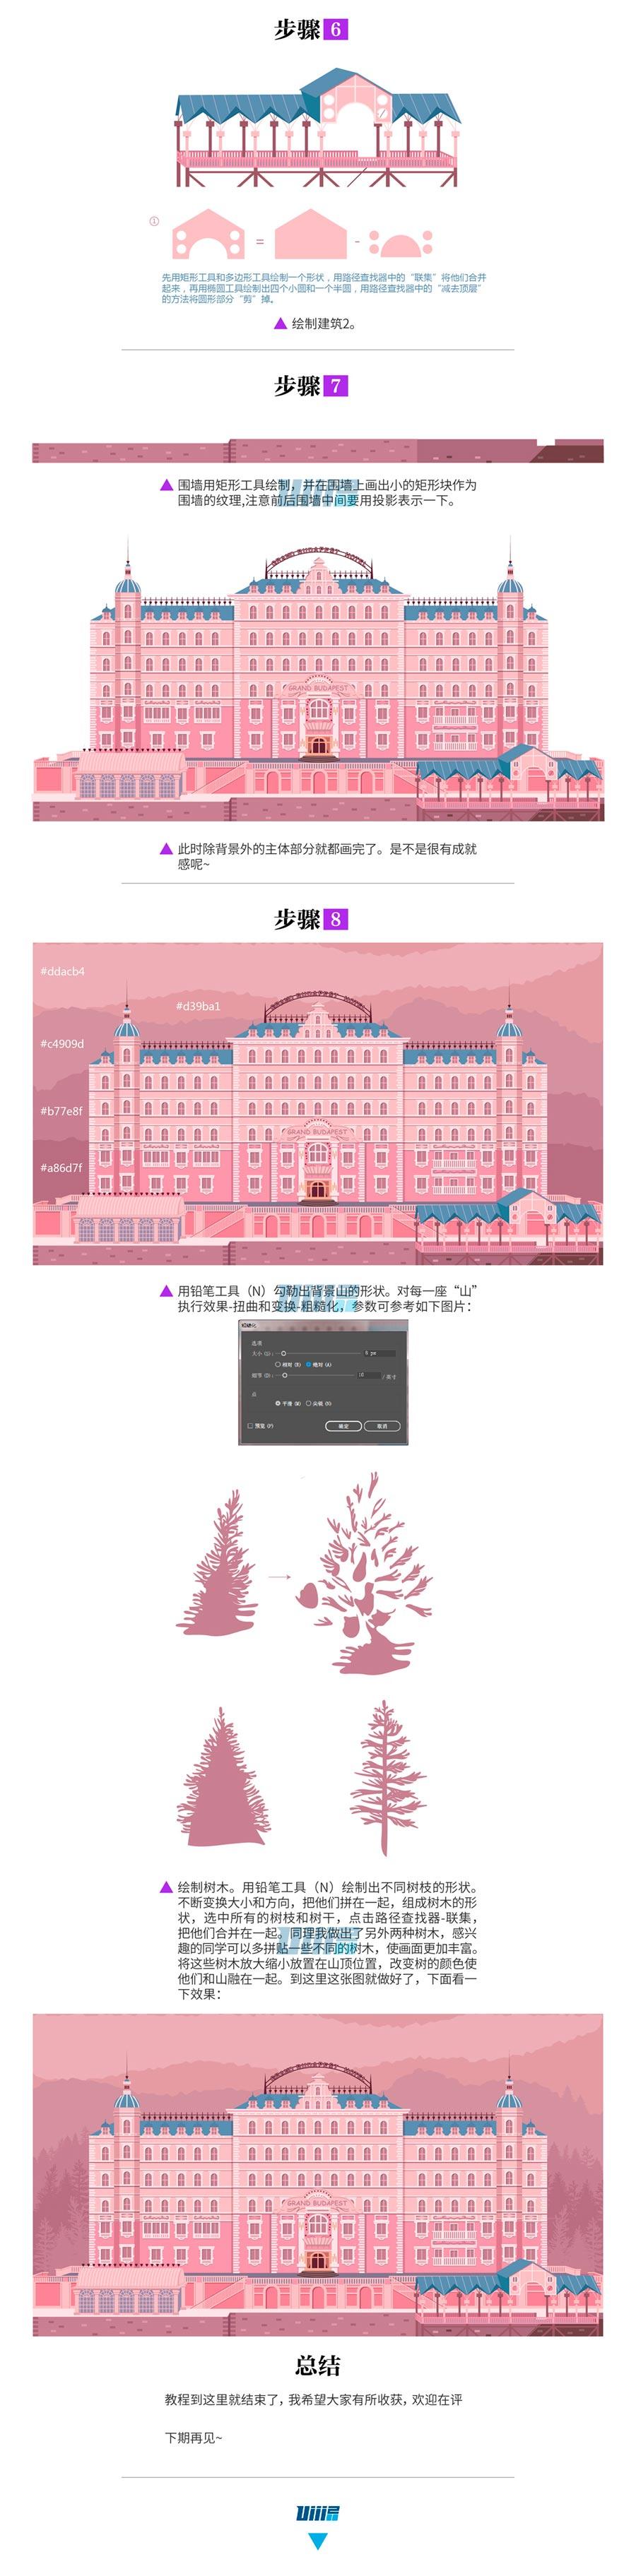 Illustrator繪製布達佩斯大飯店場景插畫